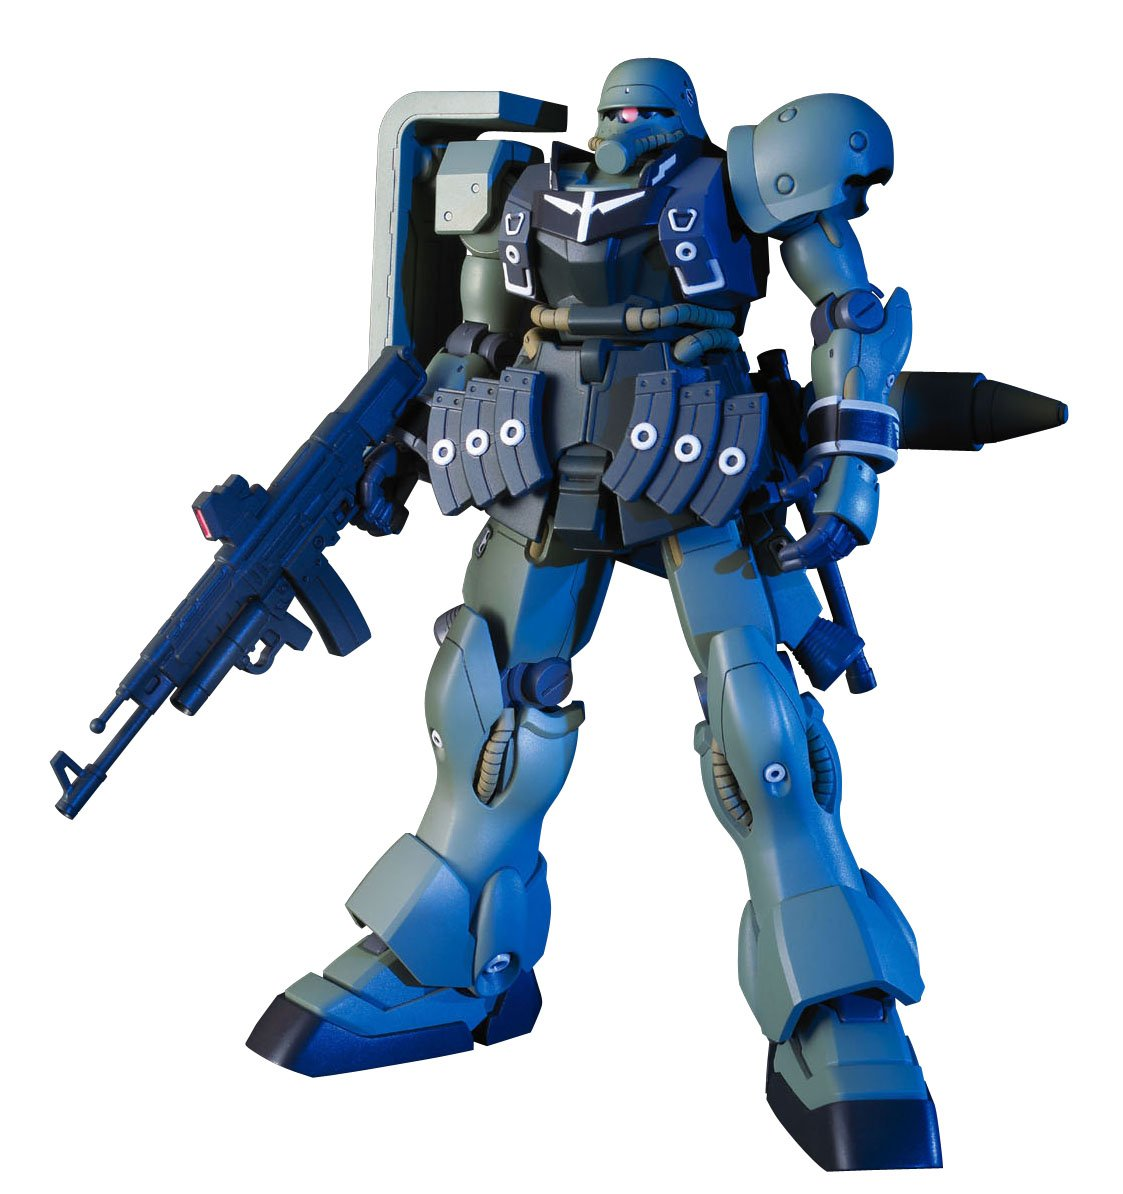 Gundam AMS-129 Geara Zulu HGUC 1/144 Scale [Toy] (japan import) Bandai Hobby BAN161424